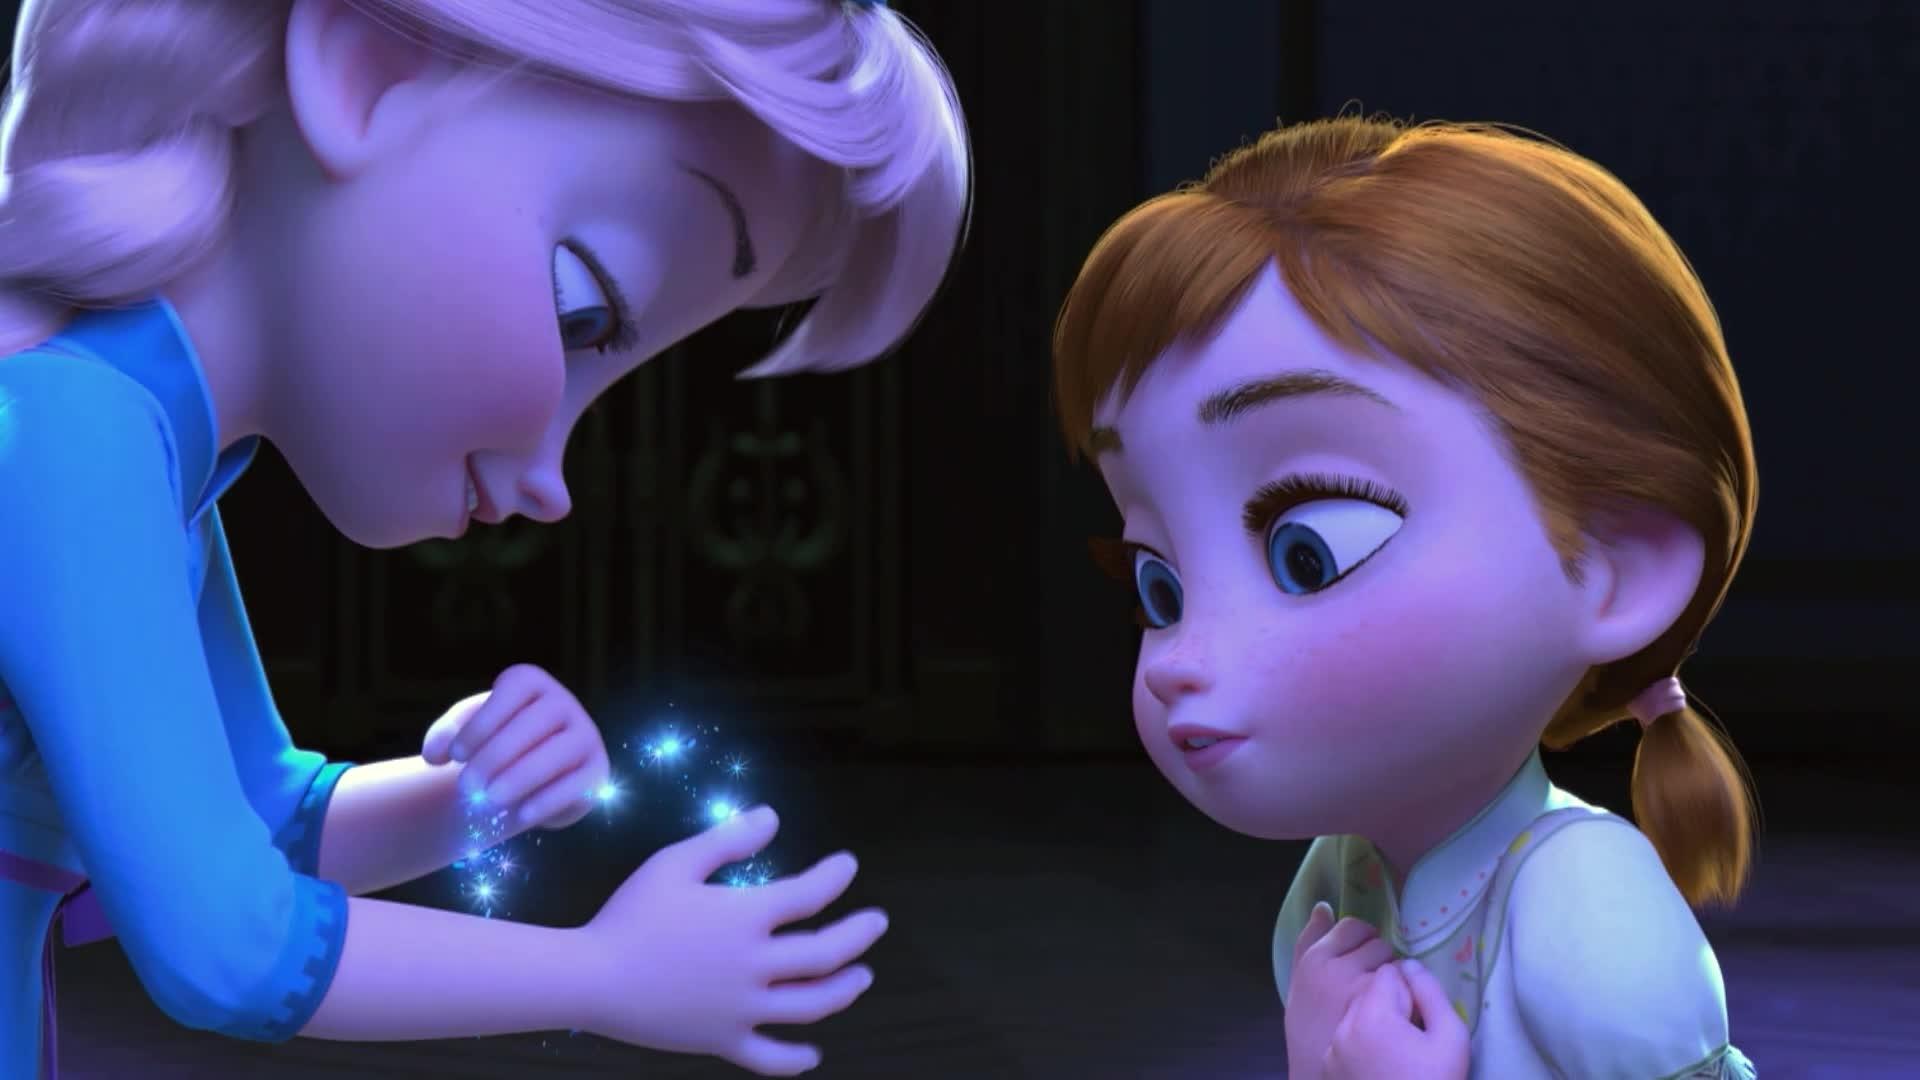 Conquista tus sueños- Madre e hija